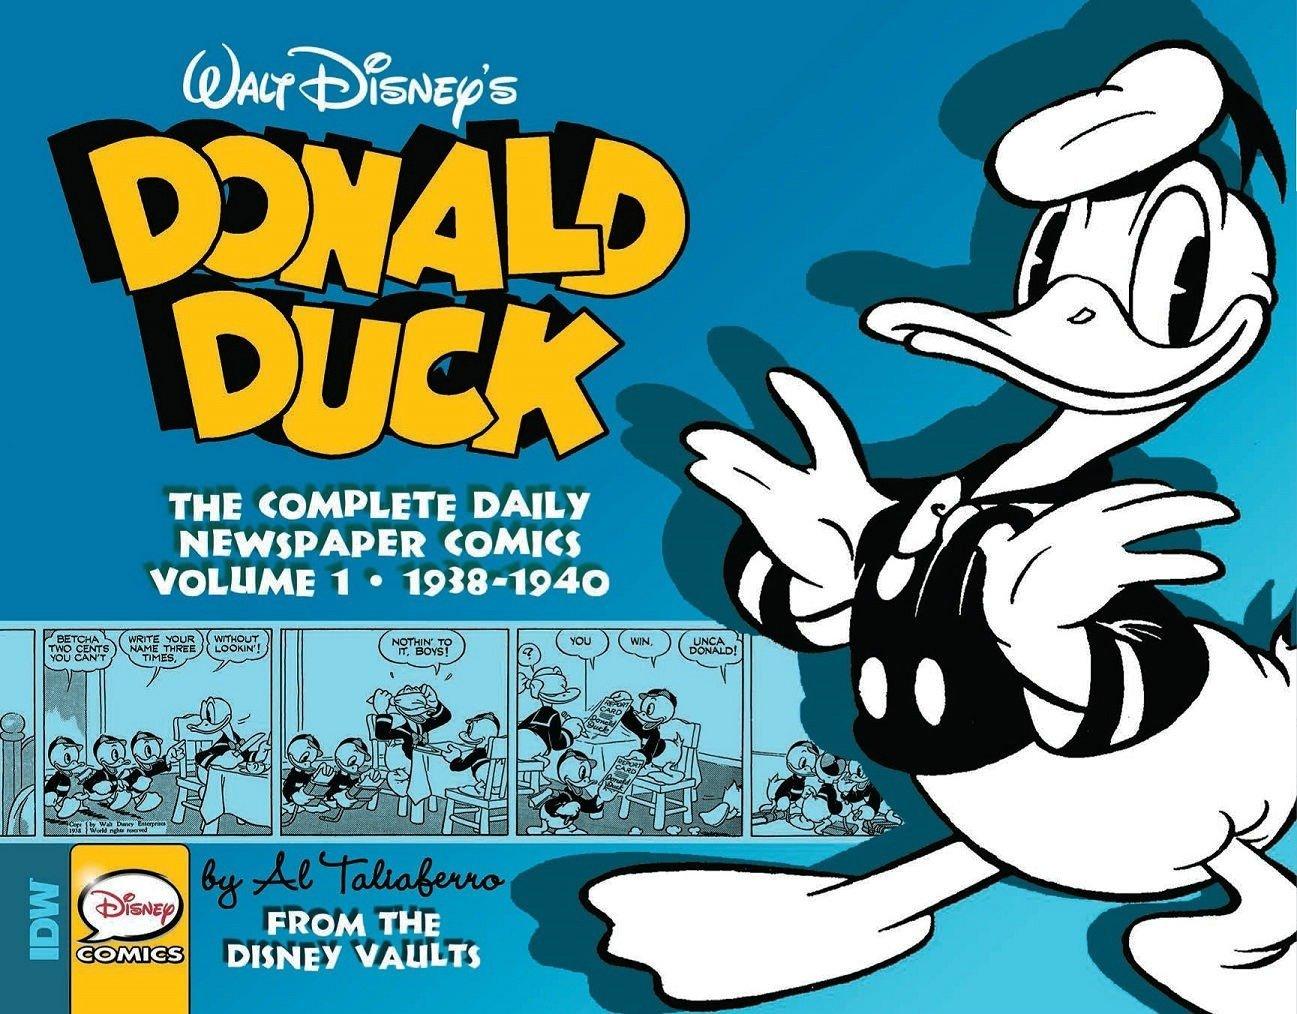 a Jobs job blow getting duck donald